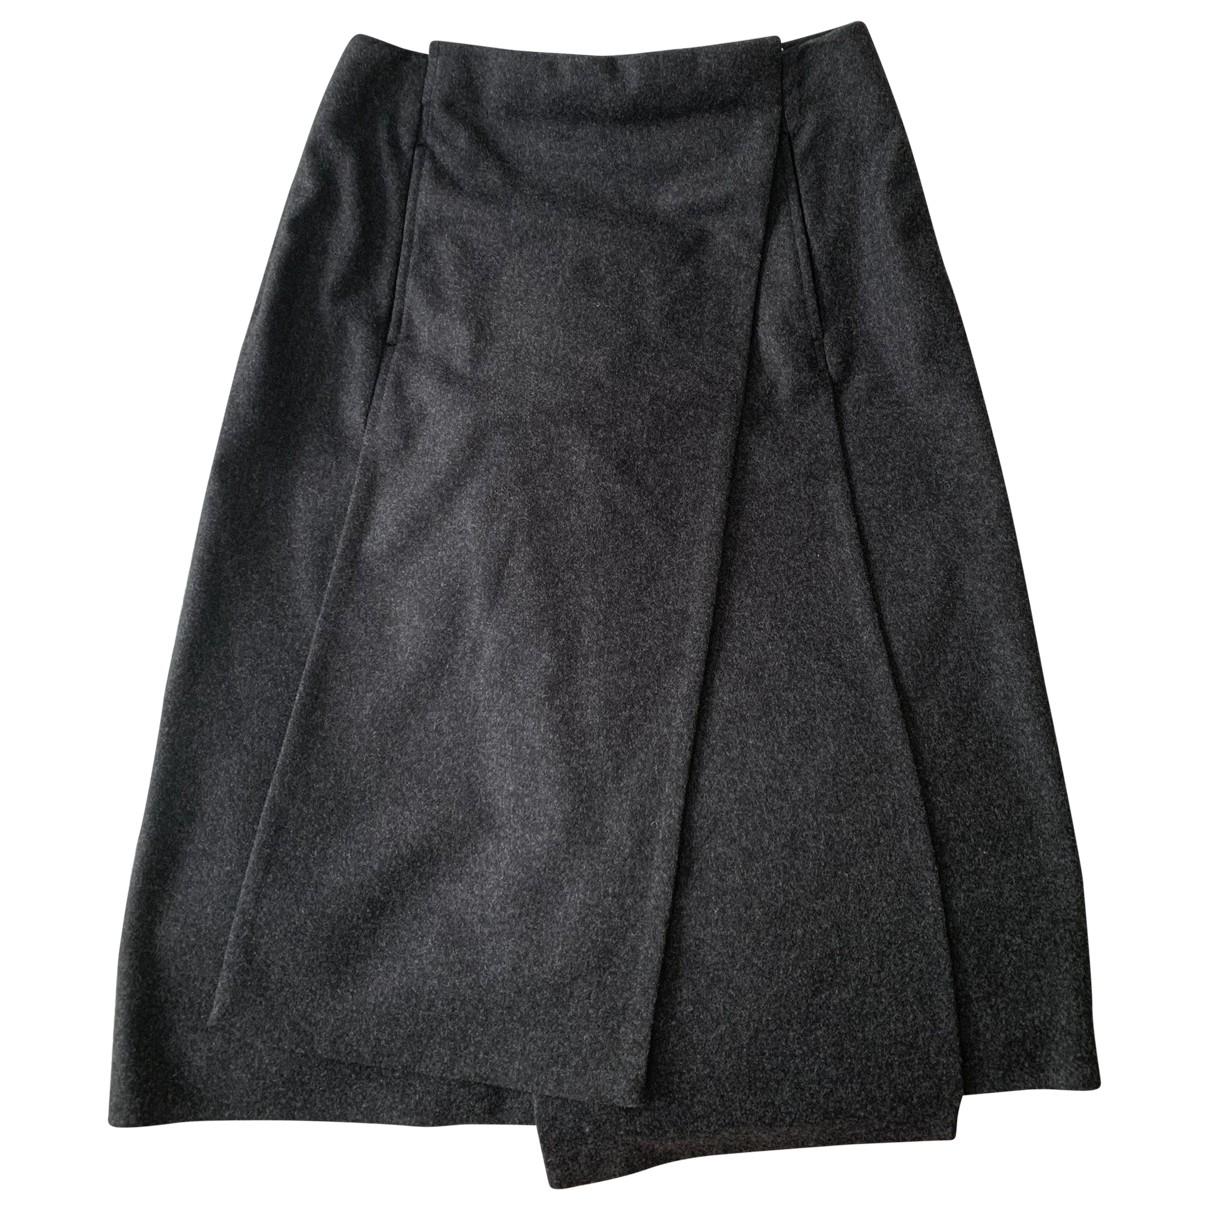 Jil Sander \N Grey Wool skirt for Women 34 FR